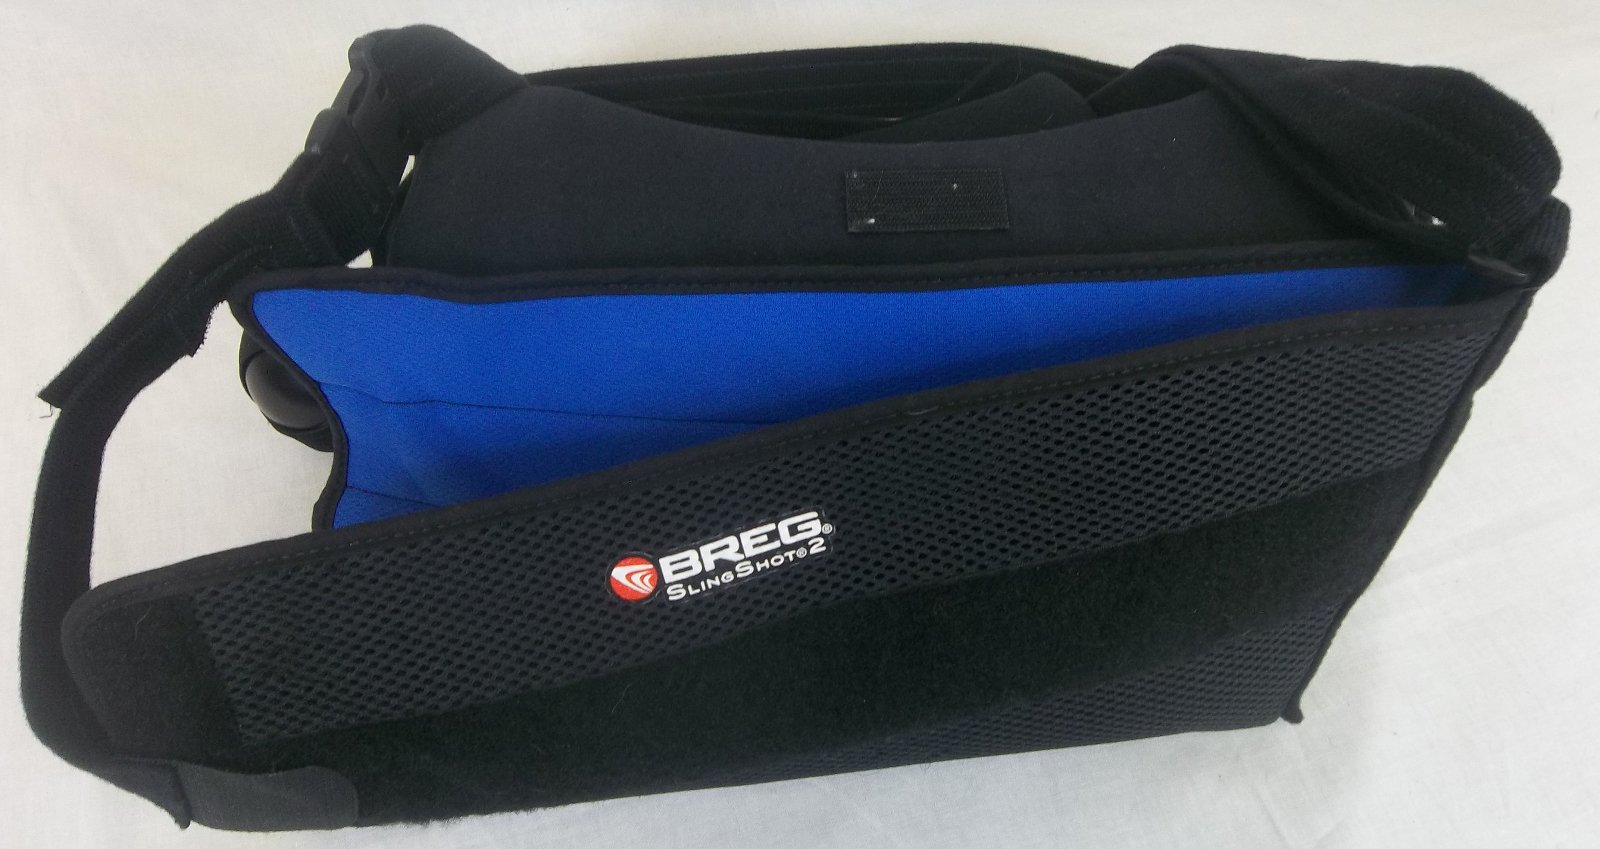 Breg SlingShot 2 Shoulder Brace (Medium) by Breg Braces